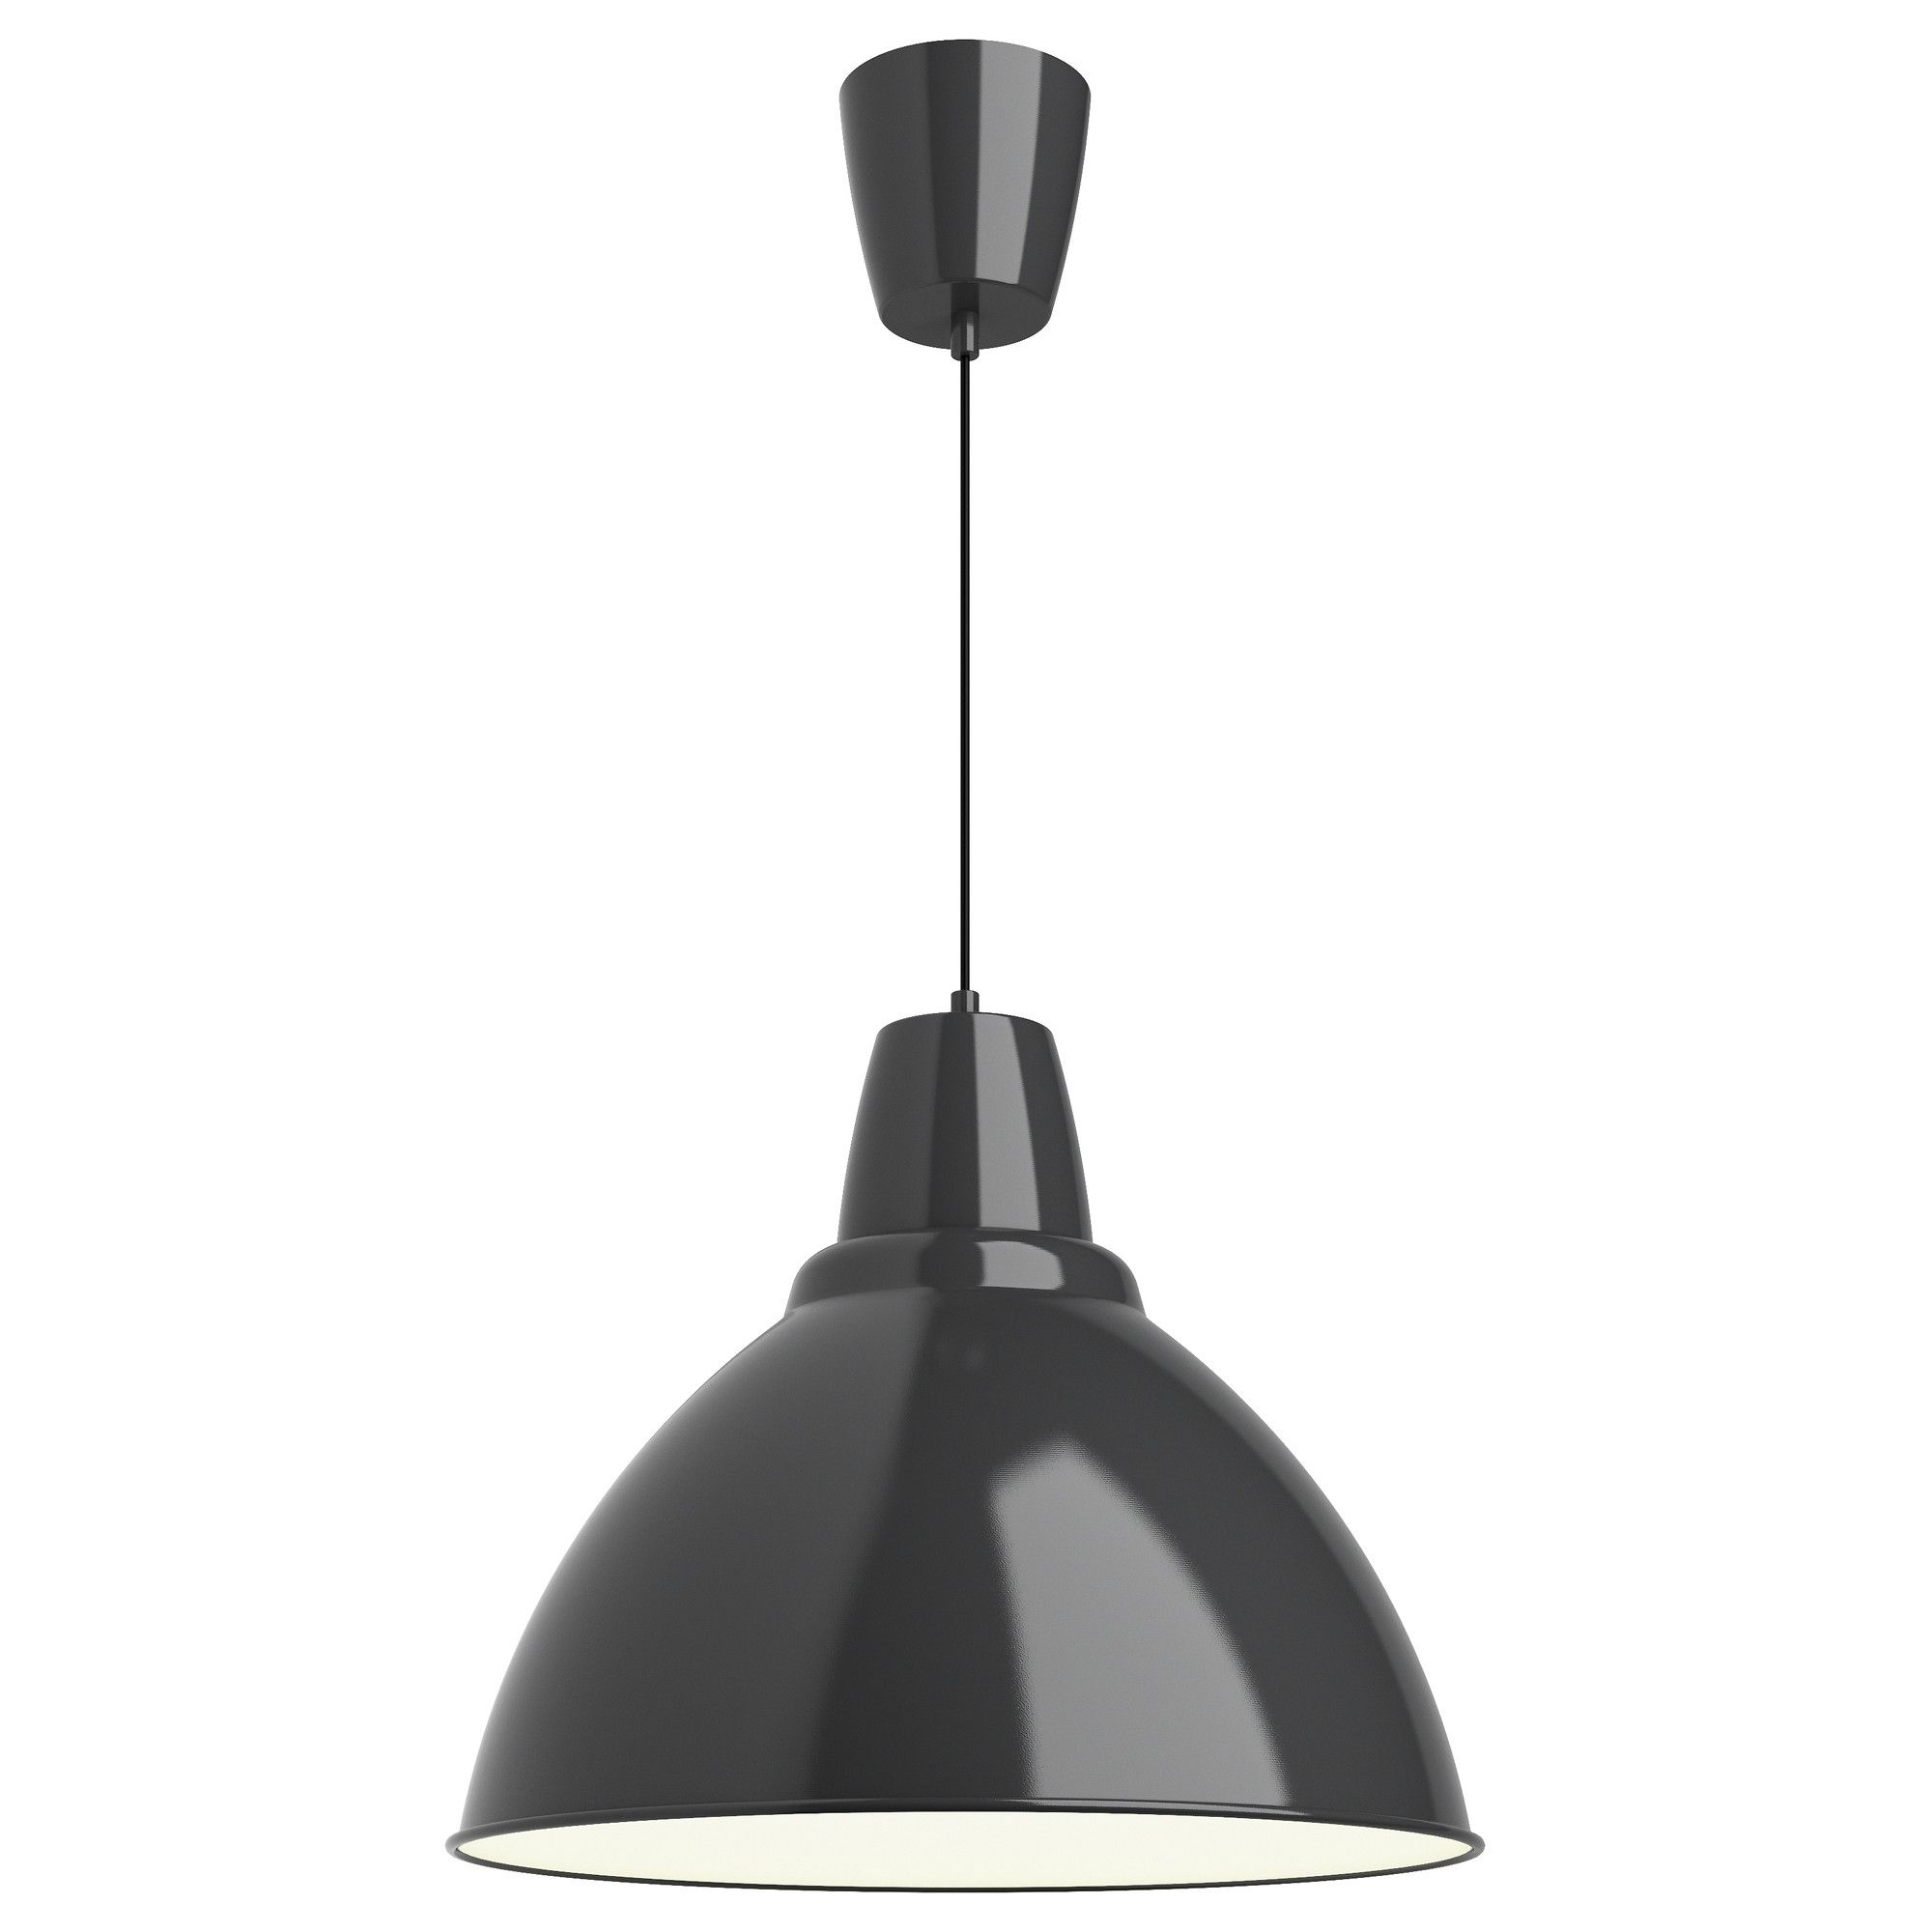 Foto pendant lamp ikea barn remodel pinterest diferentes foto pendant lamp ikea aloadofball Image collections